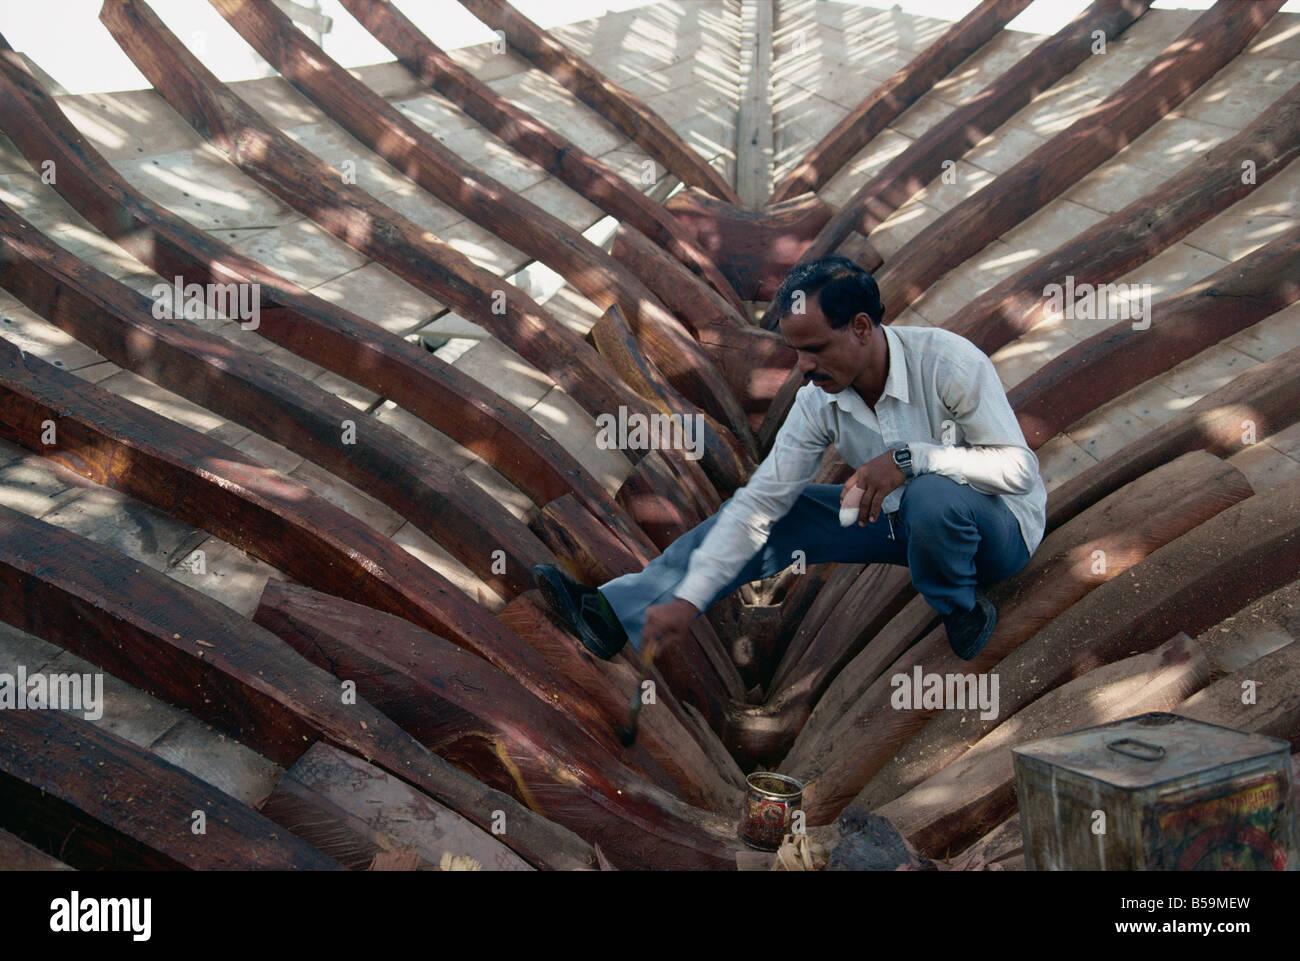 Dhow construction, Manama, Bahrain, Middle East - Stock Image